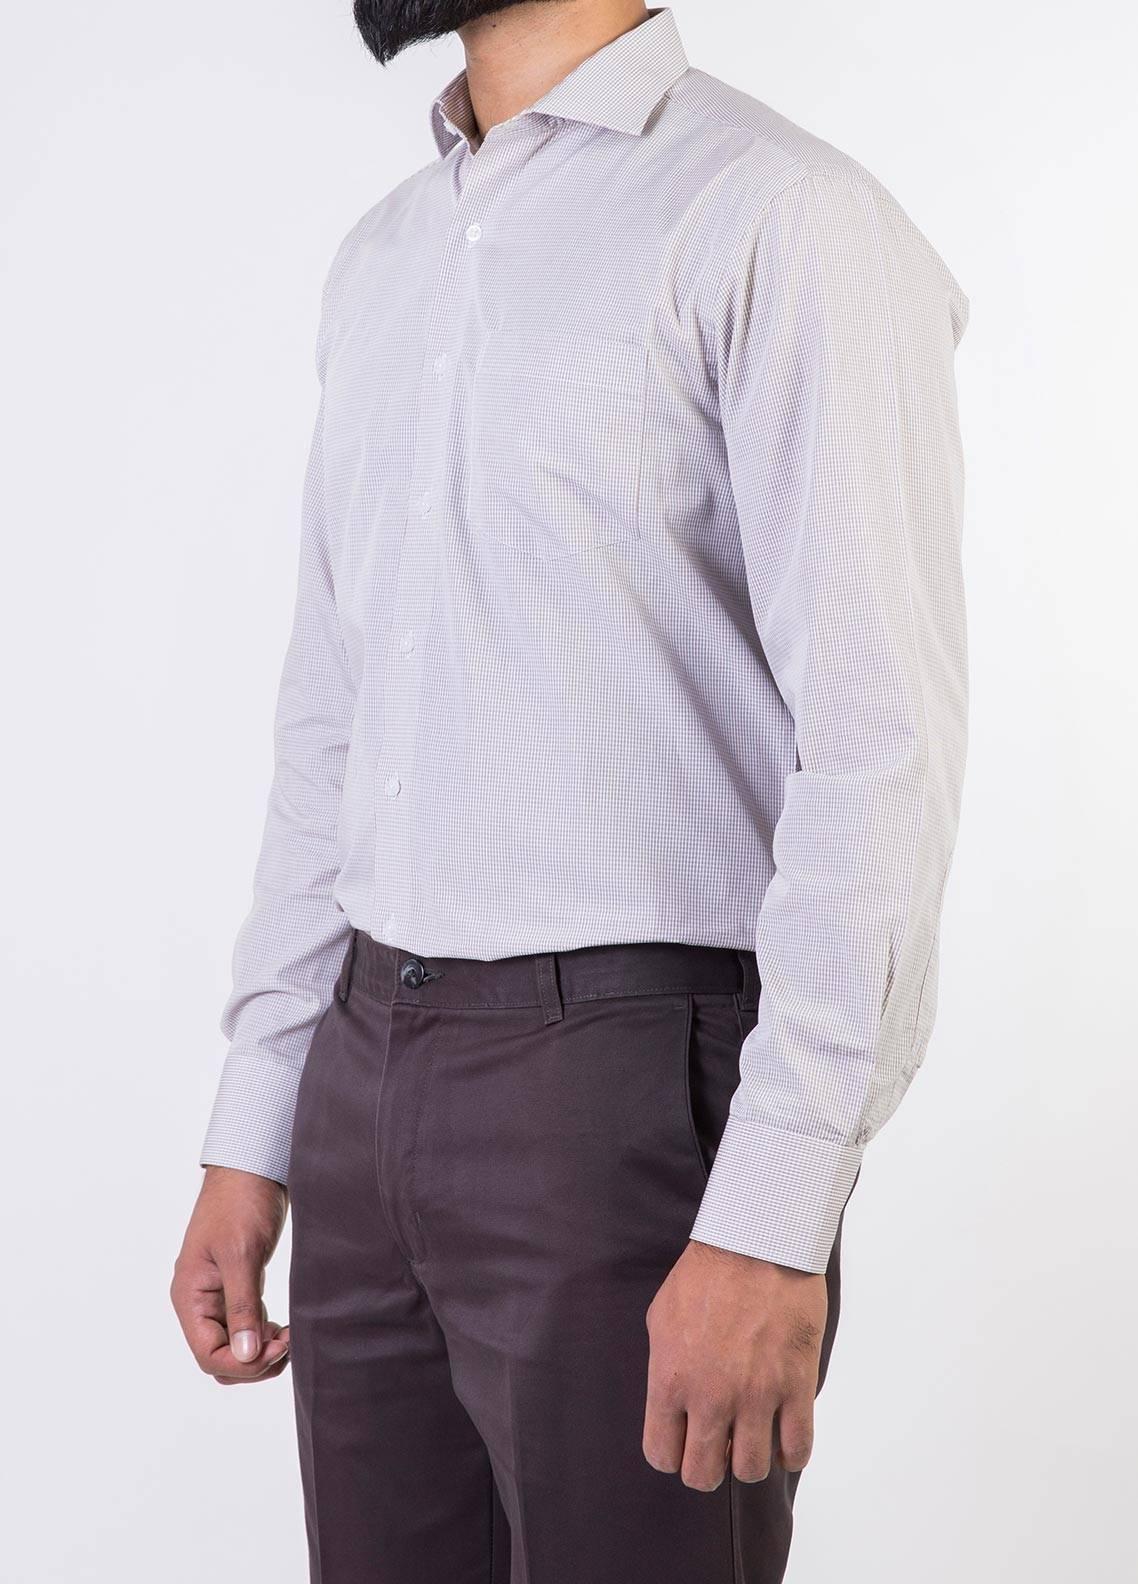 Bien Habille Cotton Formal Men Shirts -   White & Hot Chocolate